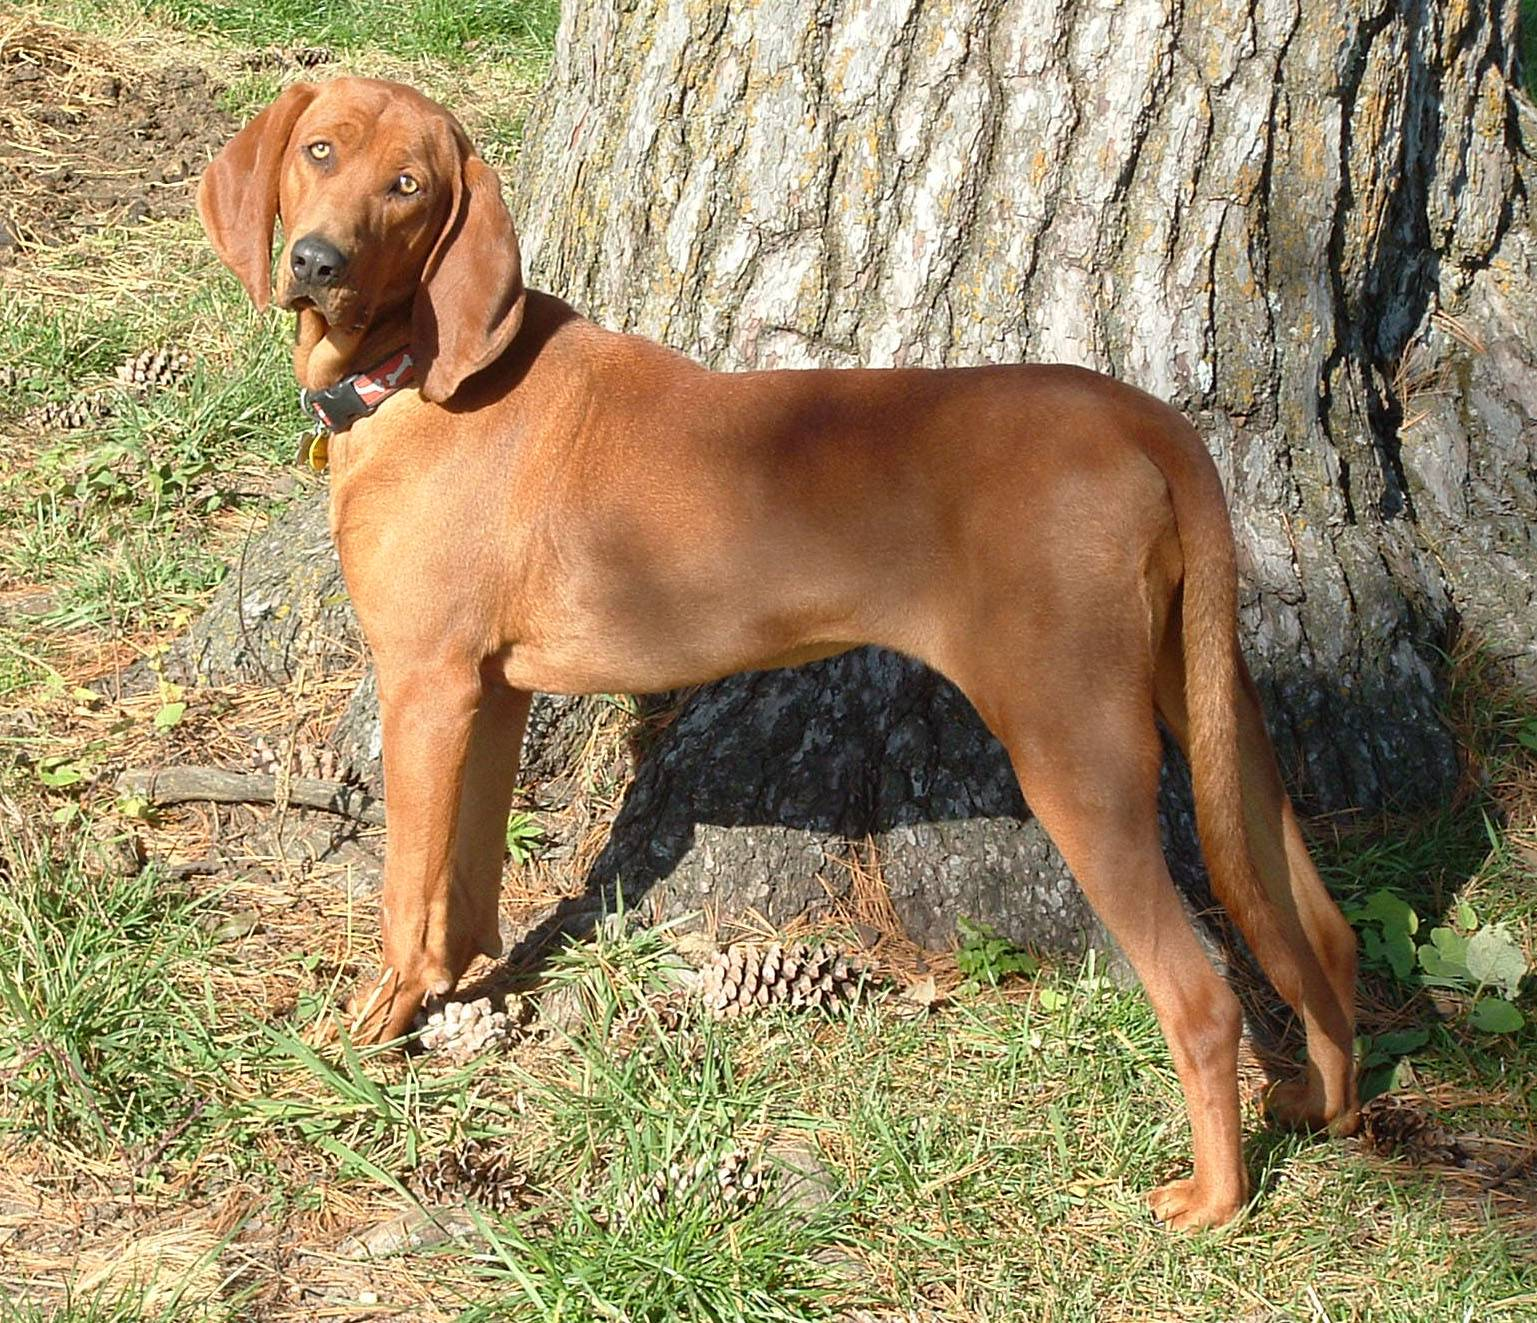 Кунхаунд (енотовая собака): рекомендации по уходу